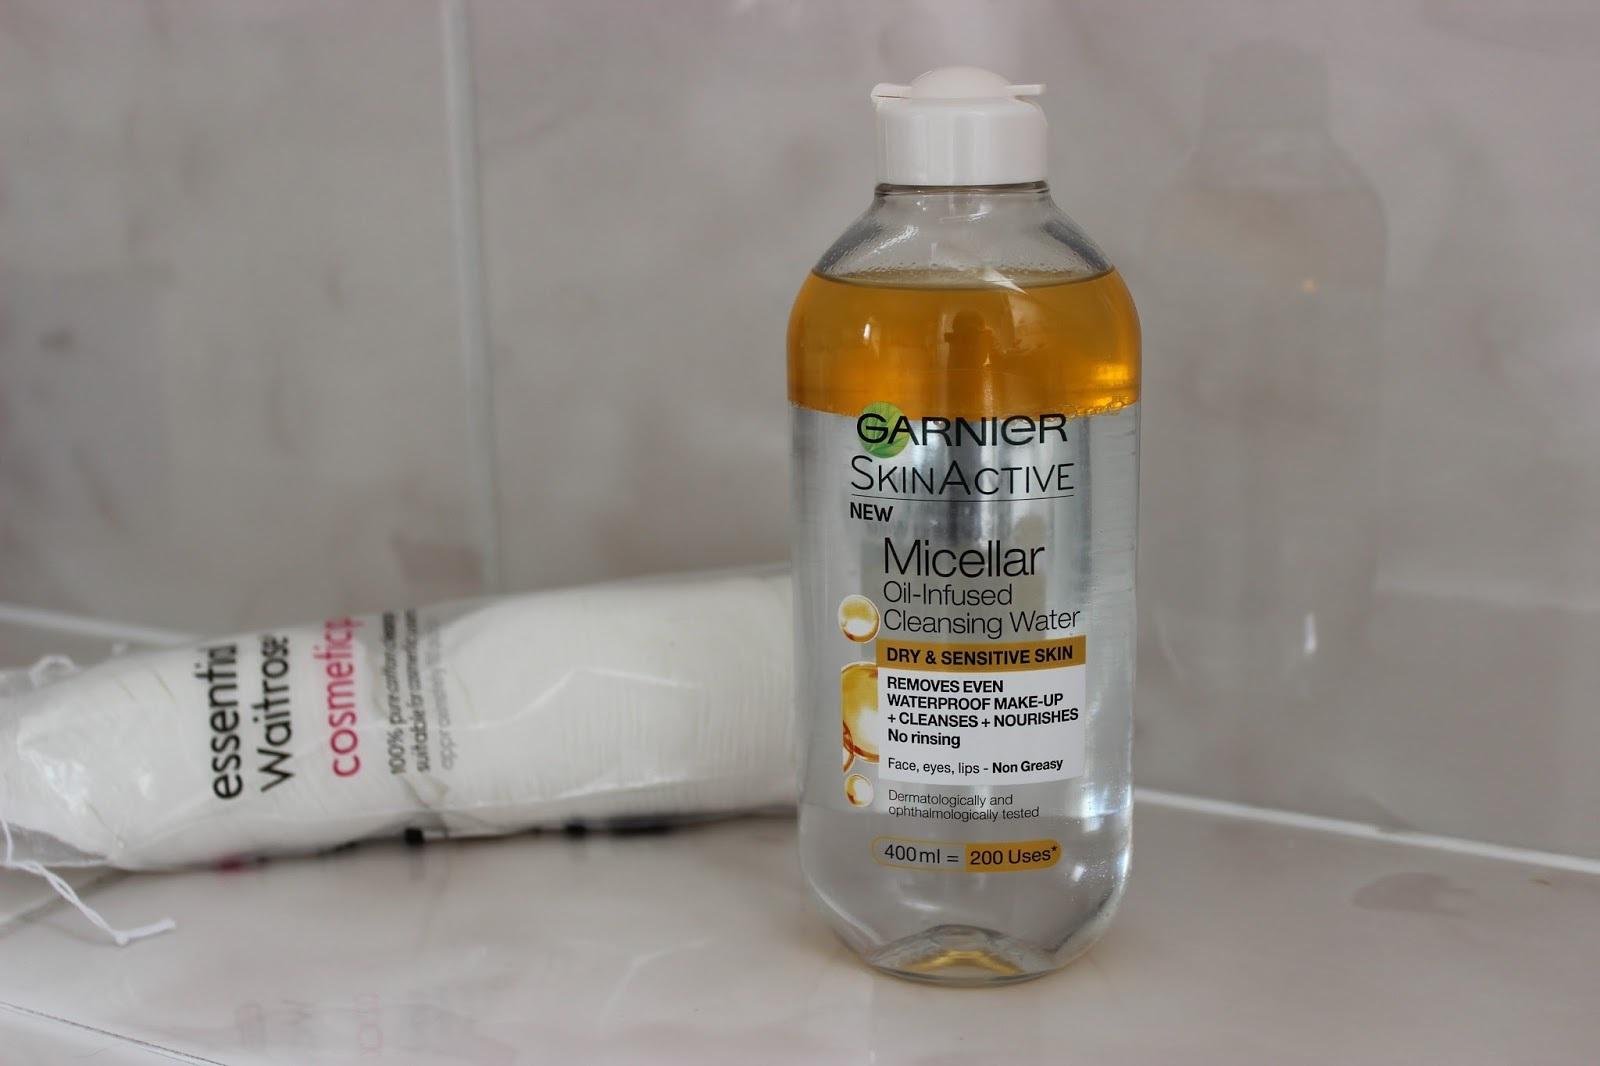 Sản phẩm tẩy trang Garnier Skin Active Oil Infused Micellar Cleansing Water